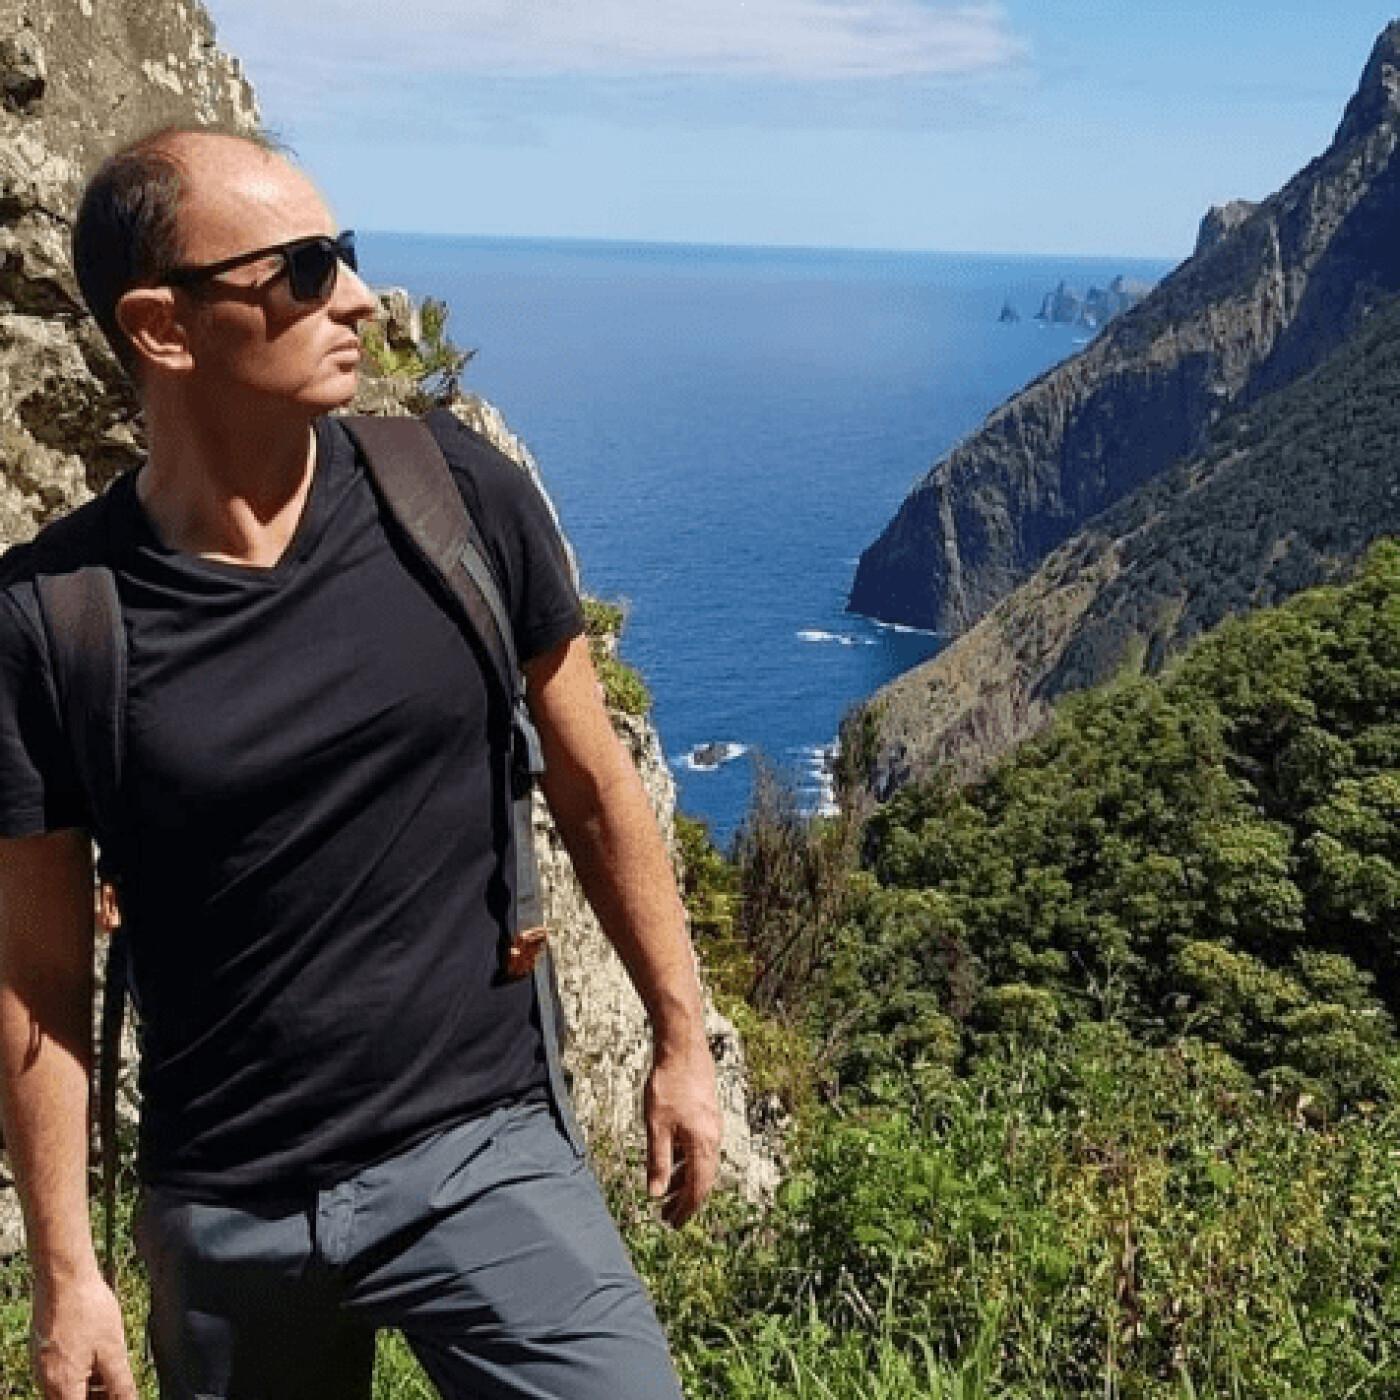 Vos vacances a Madére, on en parle avec Alexandre - 17 05 2021 - StereoChic Radio